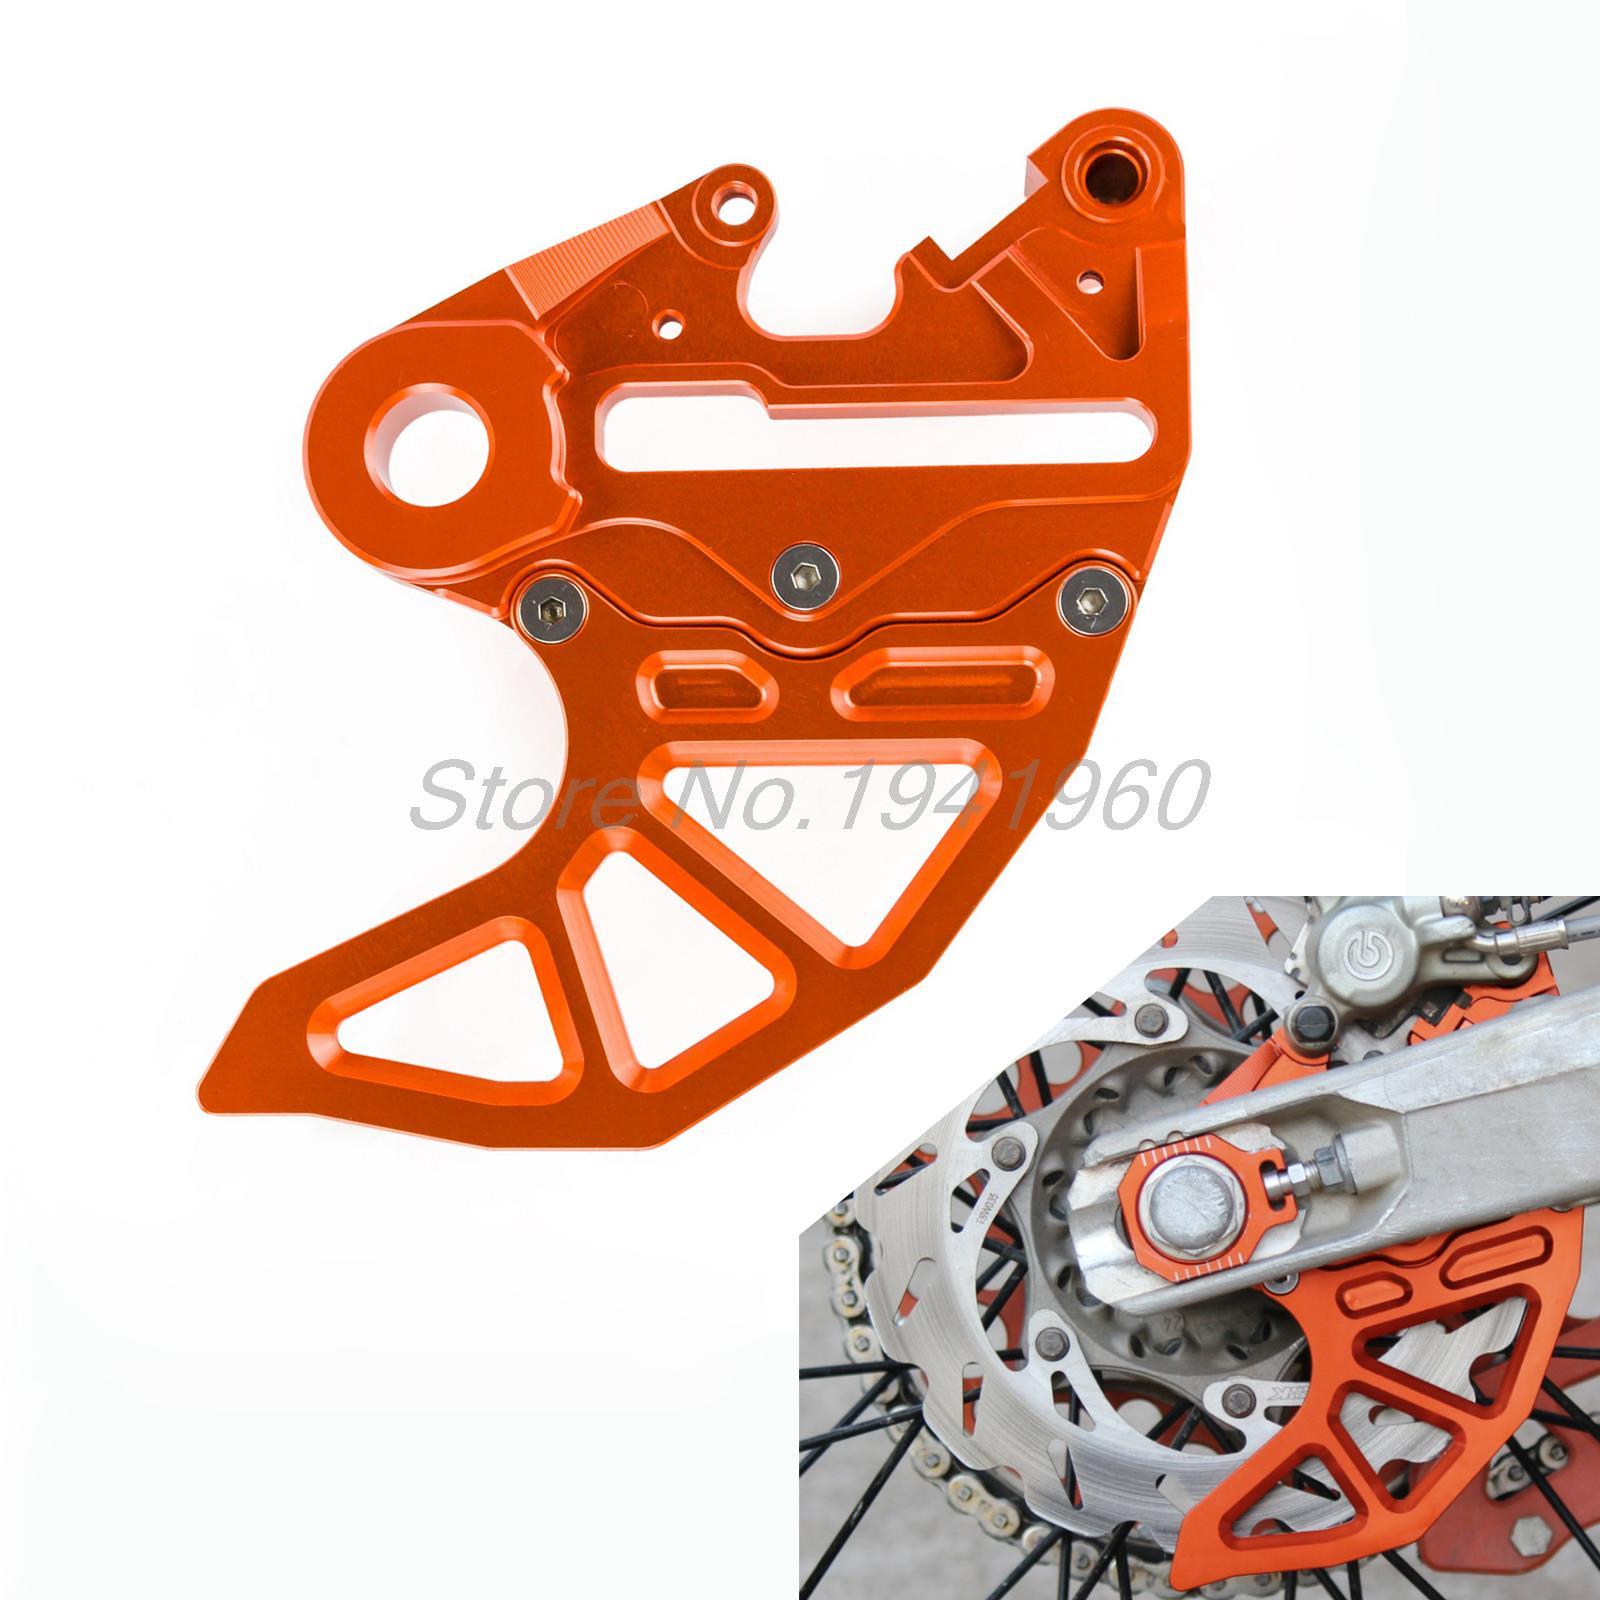 Фотография Billet CNC Rear Brake Disc Guard W/ Caliper Bracket for KTM 125-450 SX/SX-F/SMR/XC/XC-F 2013-2016